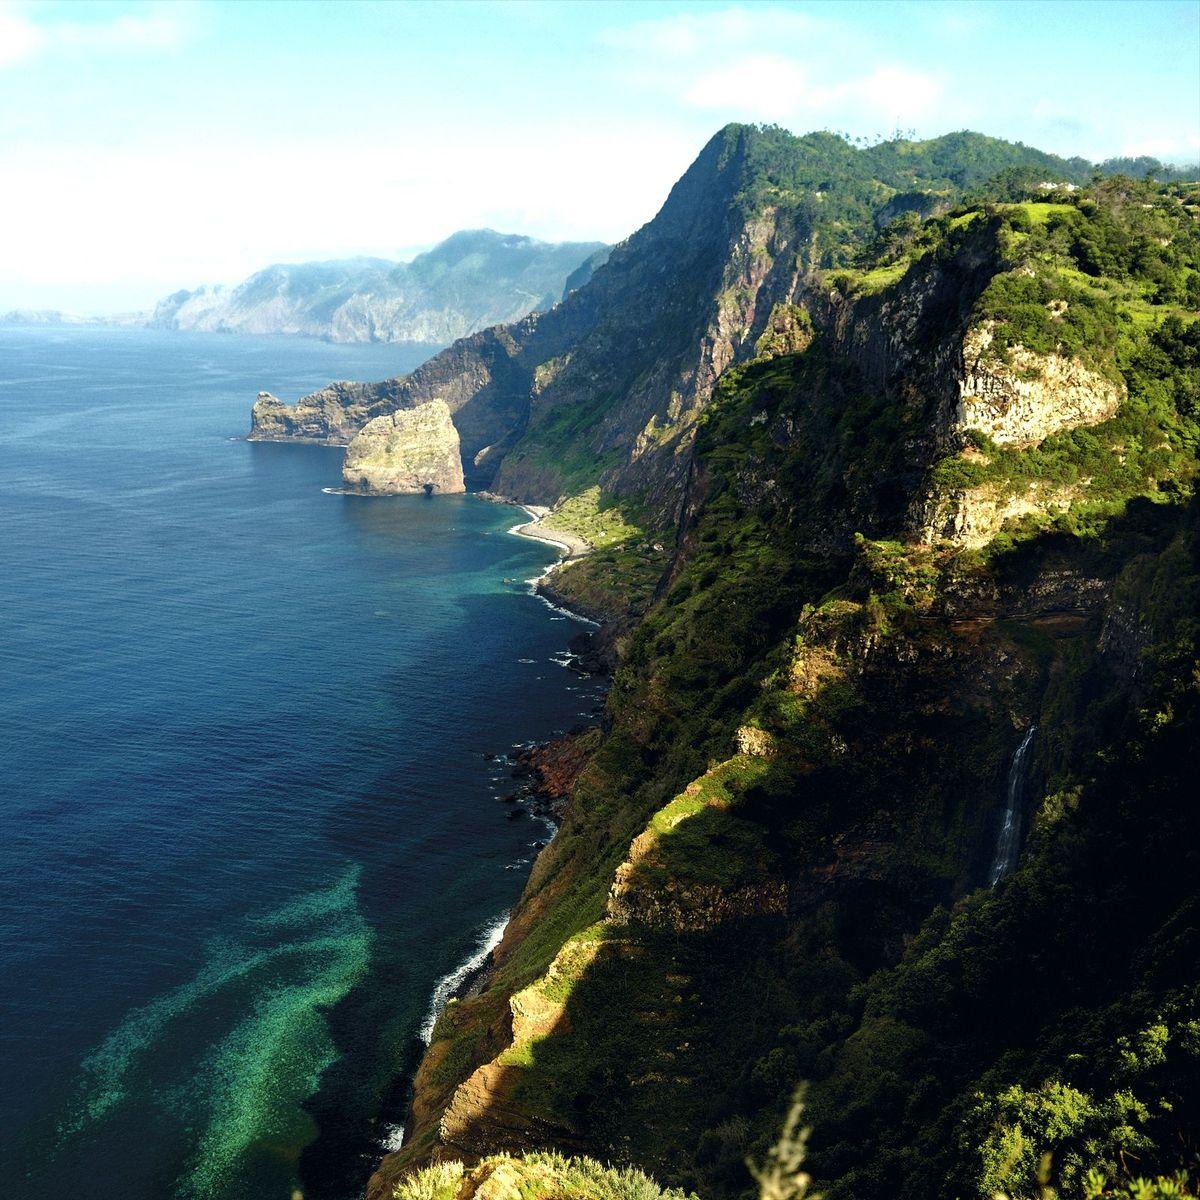 Atlantikinsel Madeira: Wildniswandern an der Betonrinne